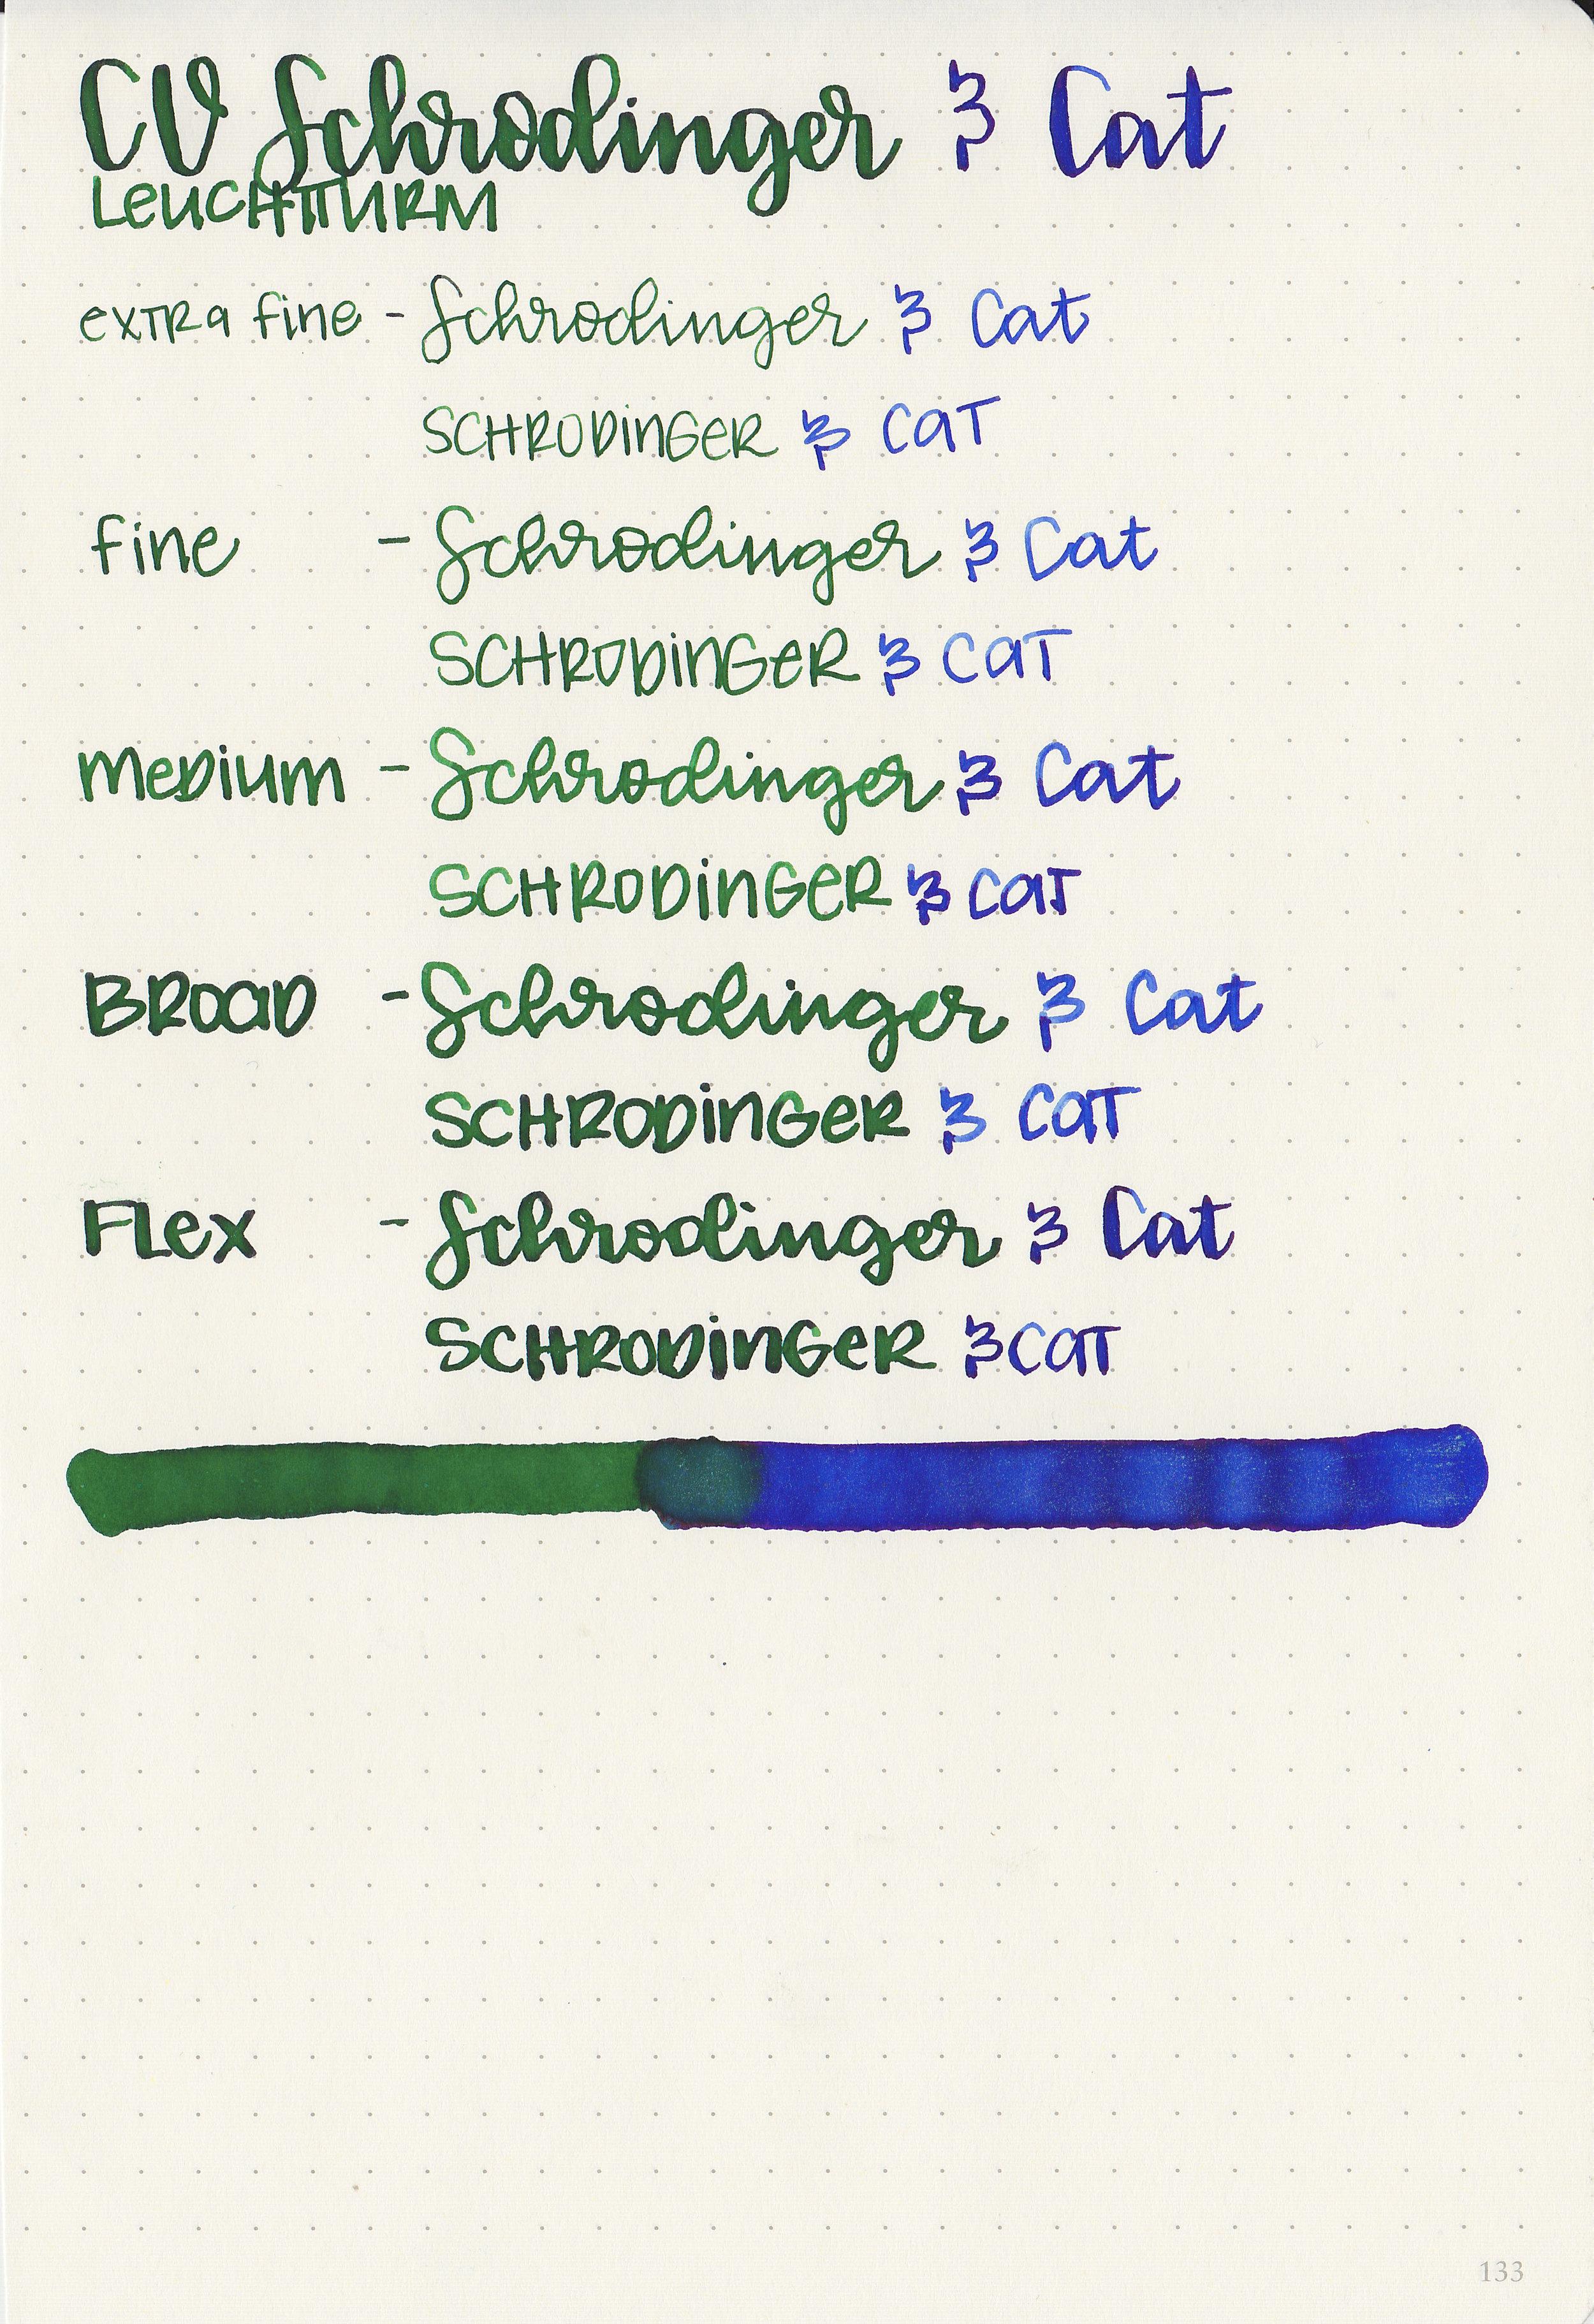 cv-schrodinger-cat-8.jpg